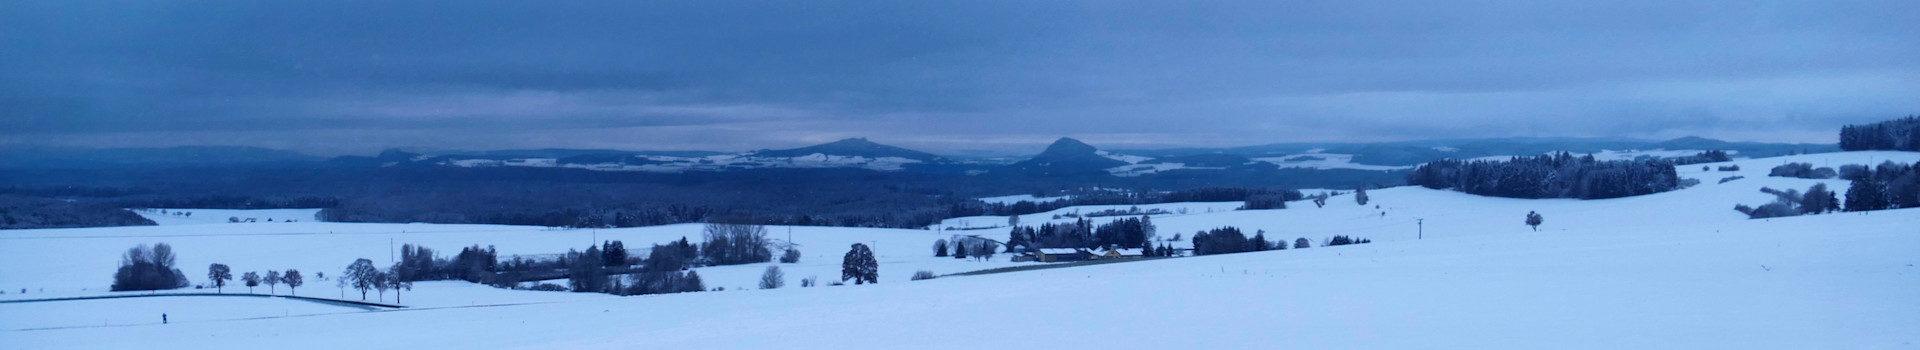 Witthoh-Winter-Rundwanderung